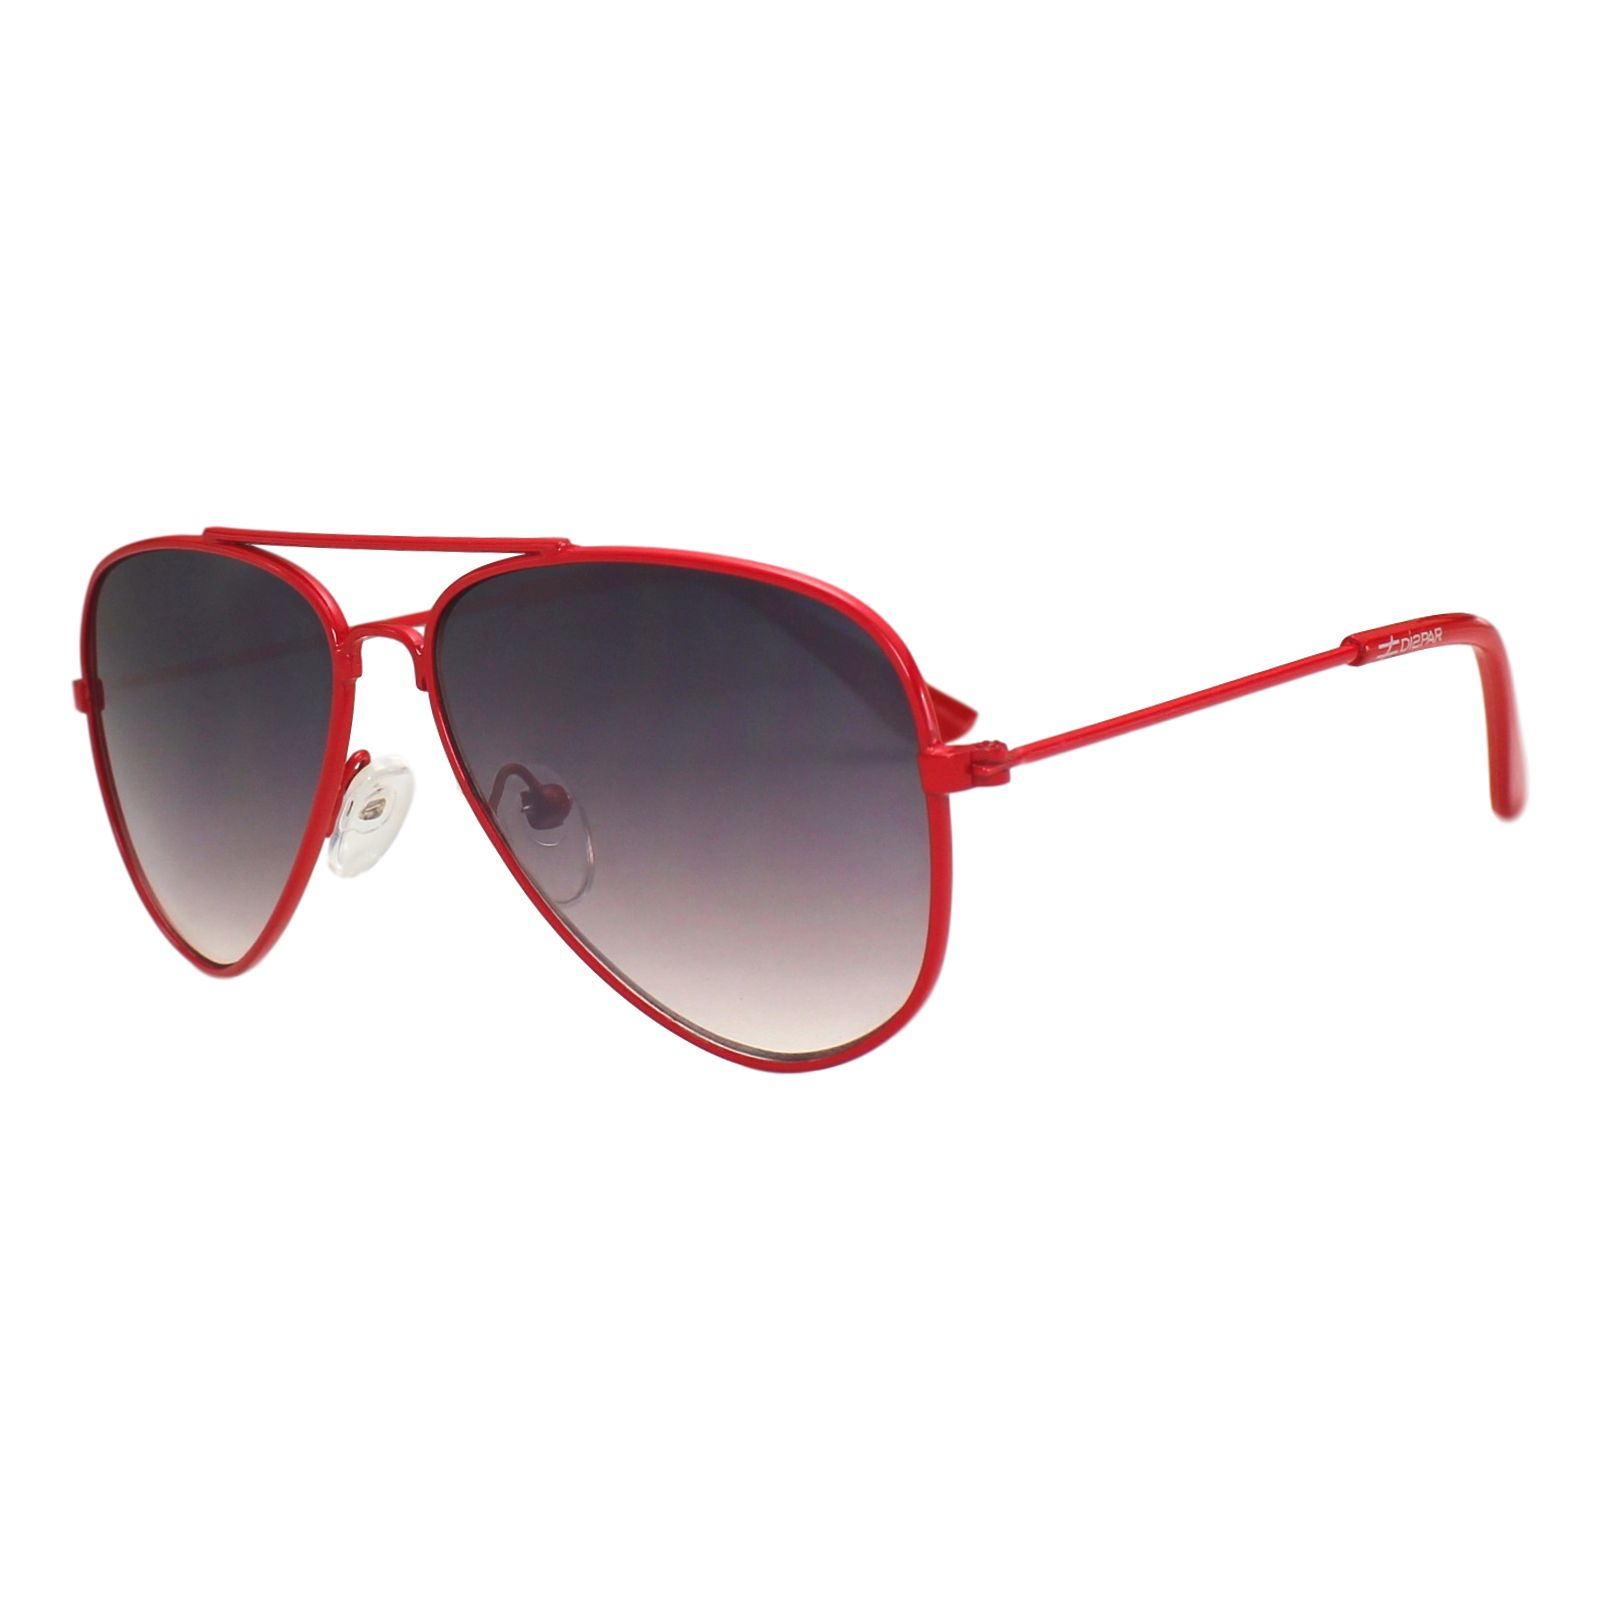 Óculos de Sol Díspar ID1797 infantil - Vermelho